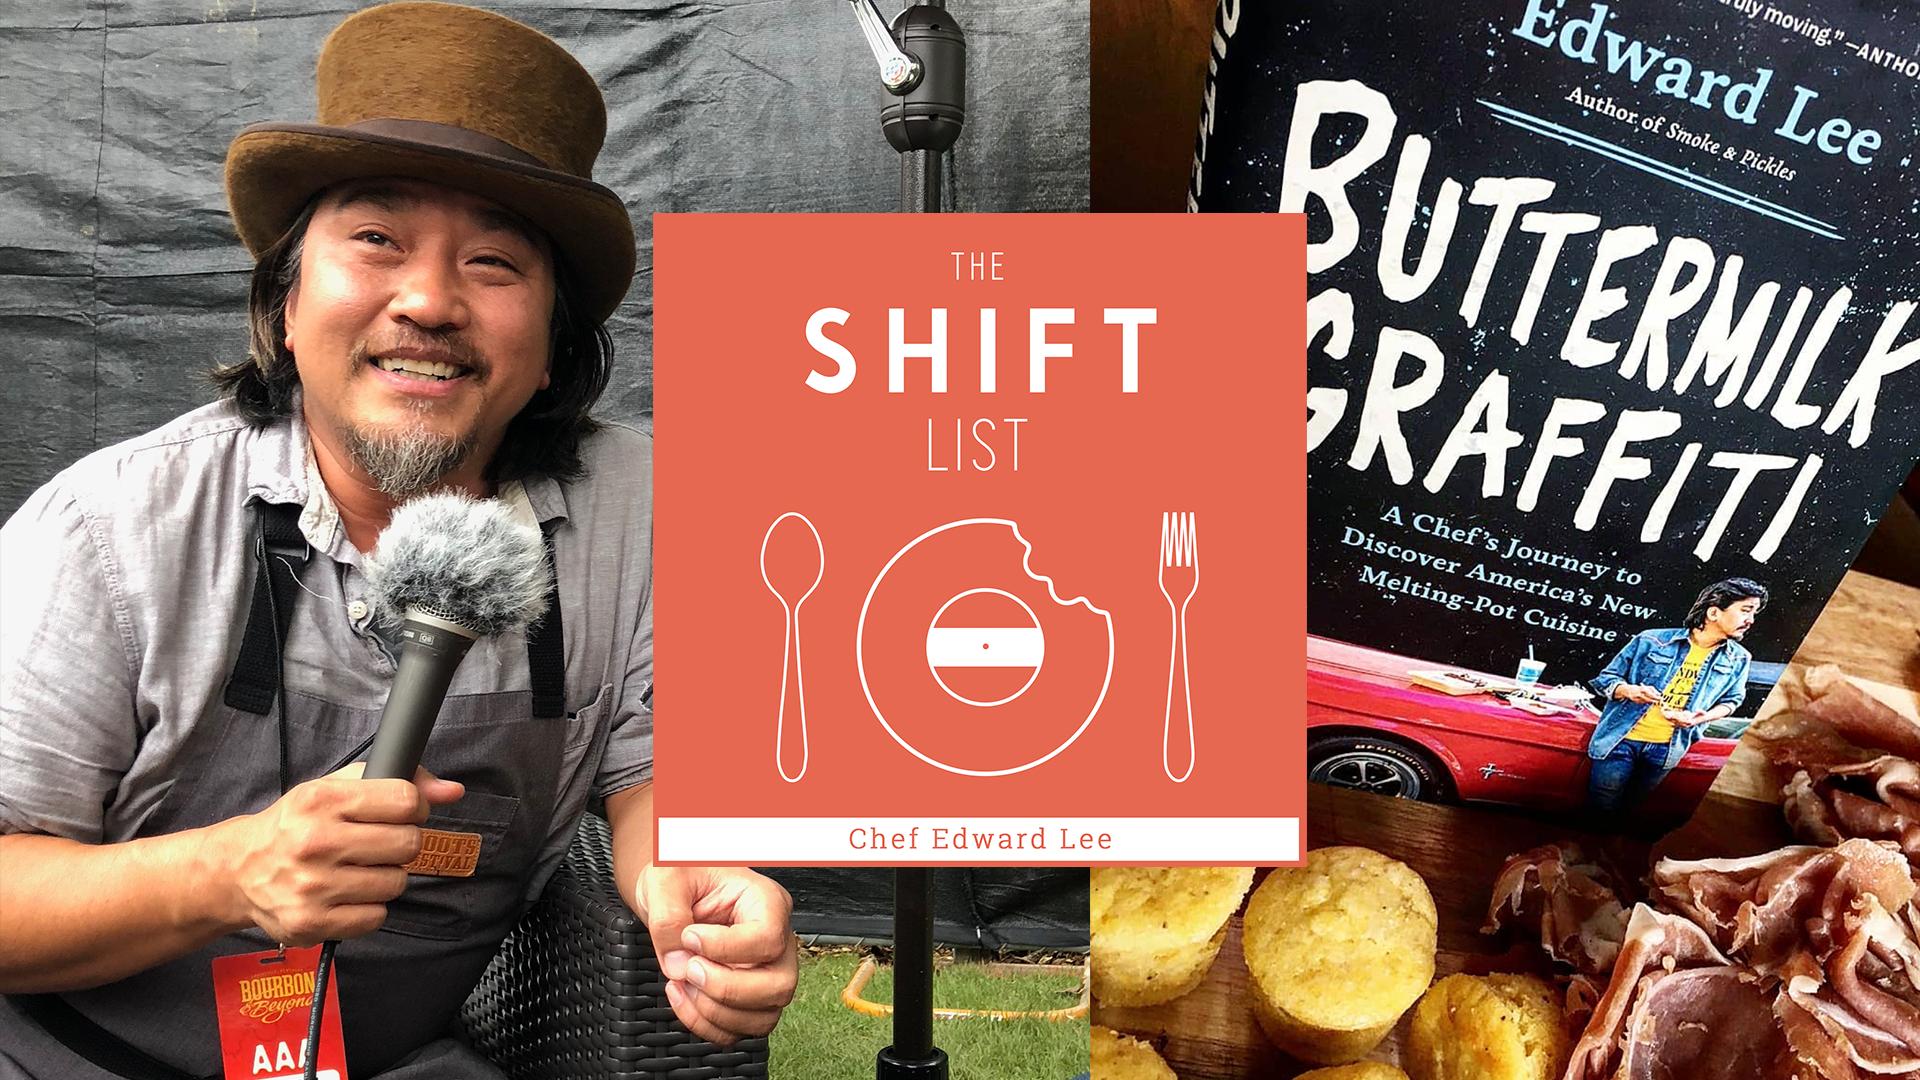 The Shift List - Edward Lee (610 Magnolia, MilkWood) Louisville